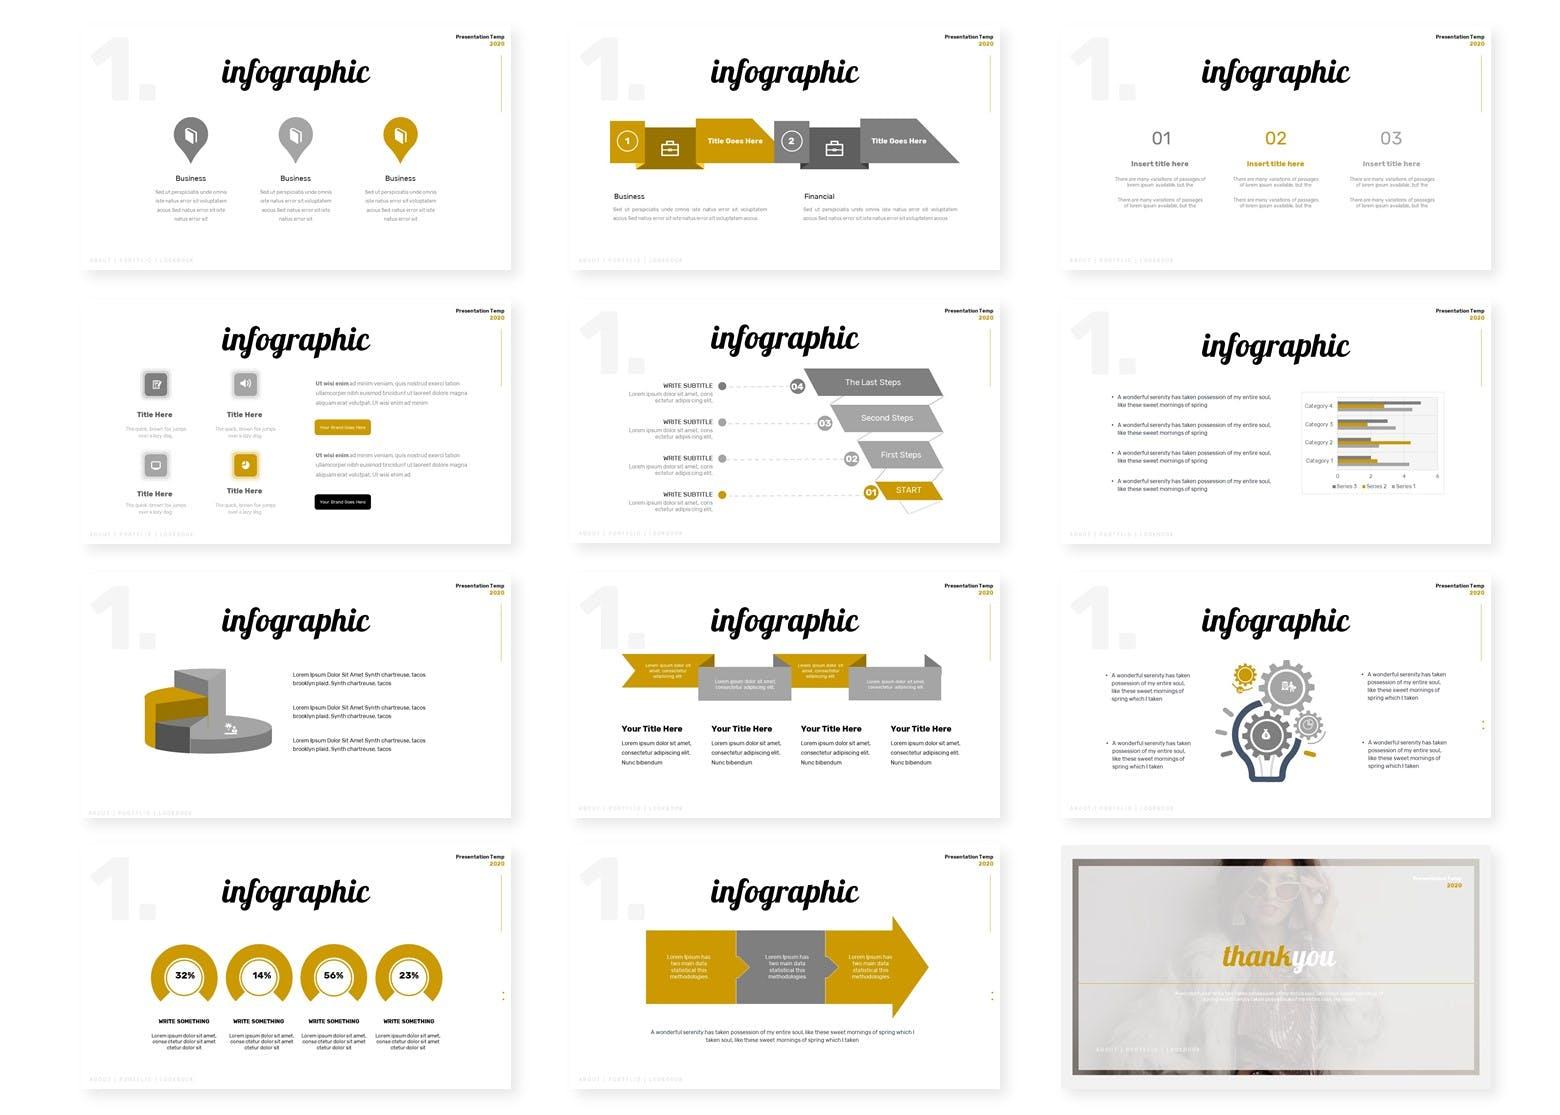 Keynote/服装品牌PPT/谷歌幻灯片三合一模板 Polosan Style | Powerpoint, Keynote, Googleslide设计素材模板